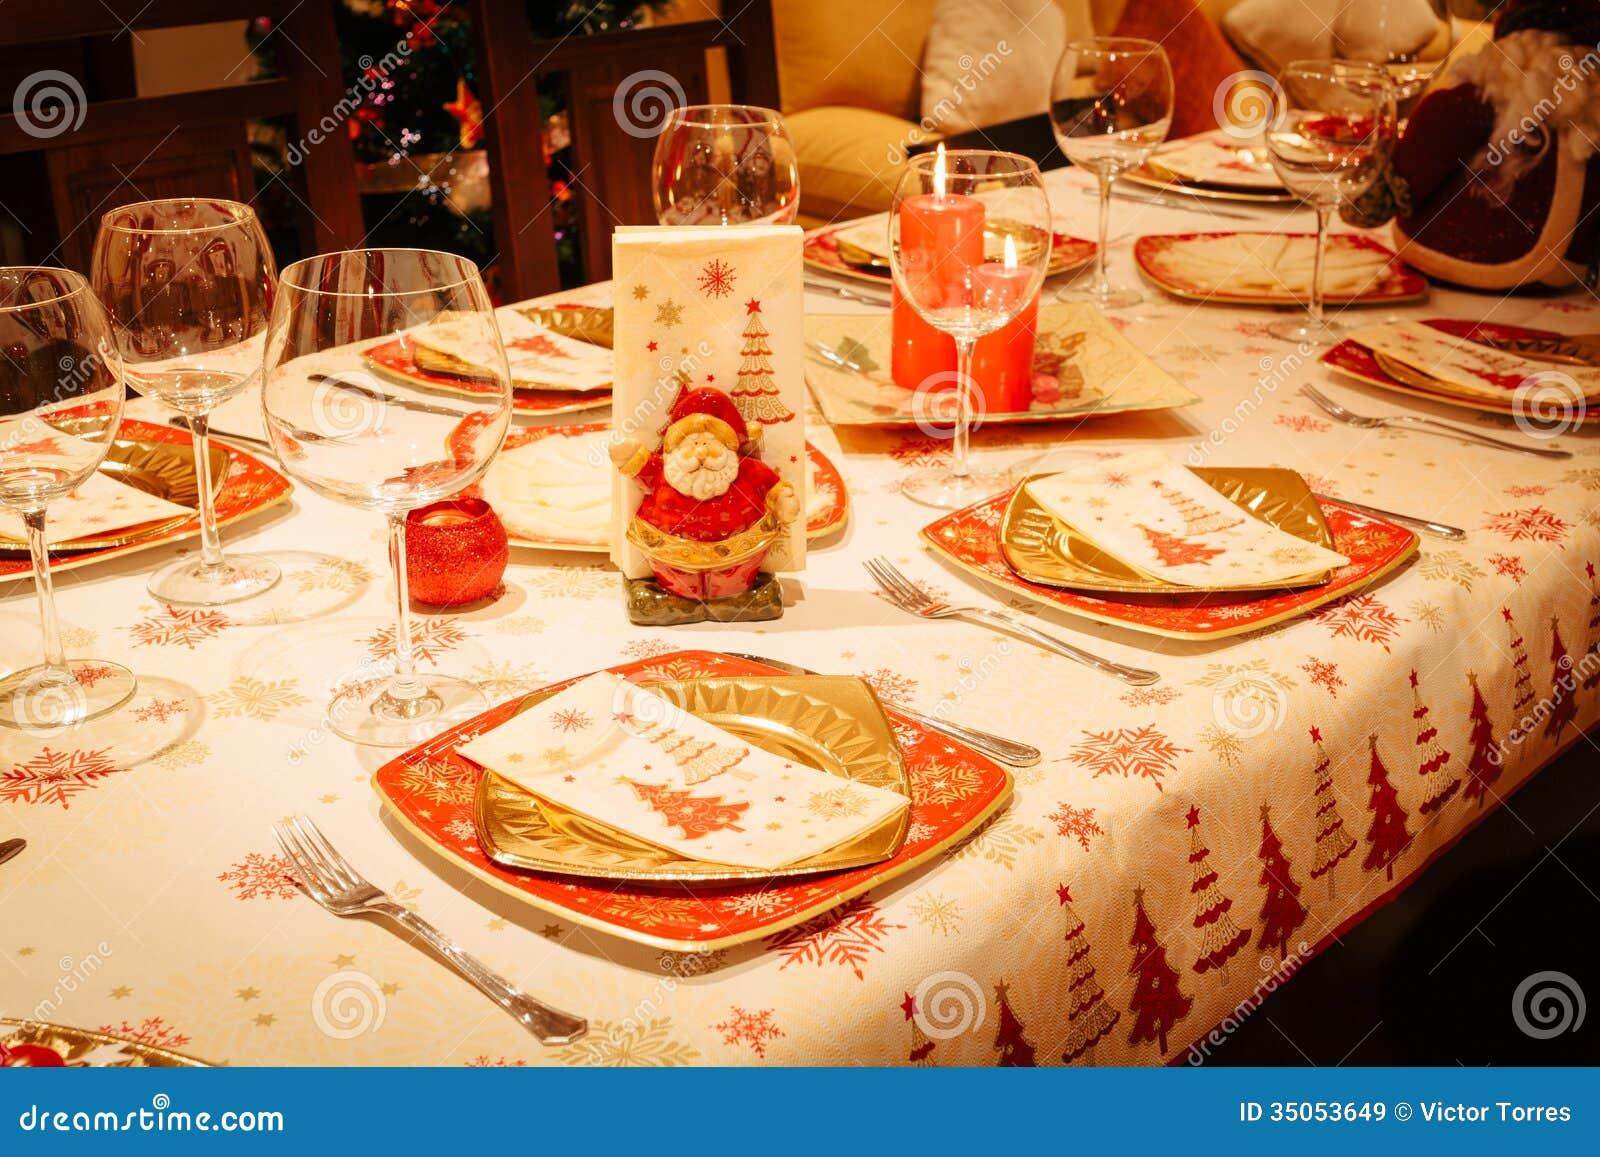 Table de salle manger de no l avec l 39 arbre de no l l - Plan de table noel ...